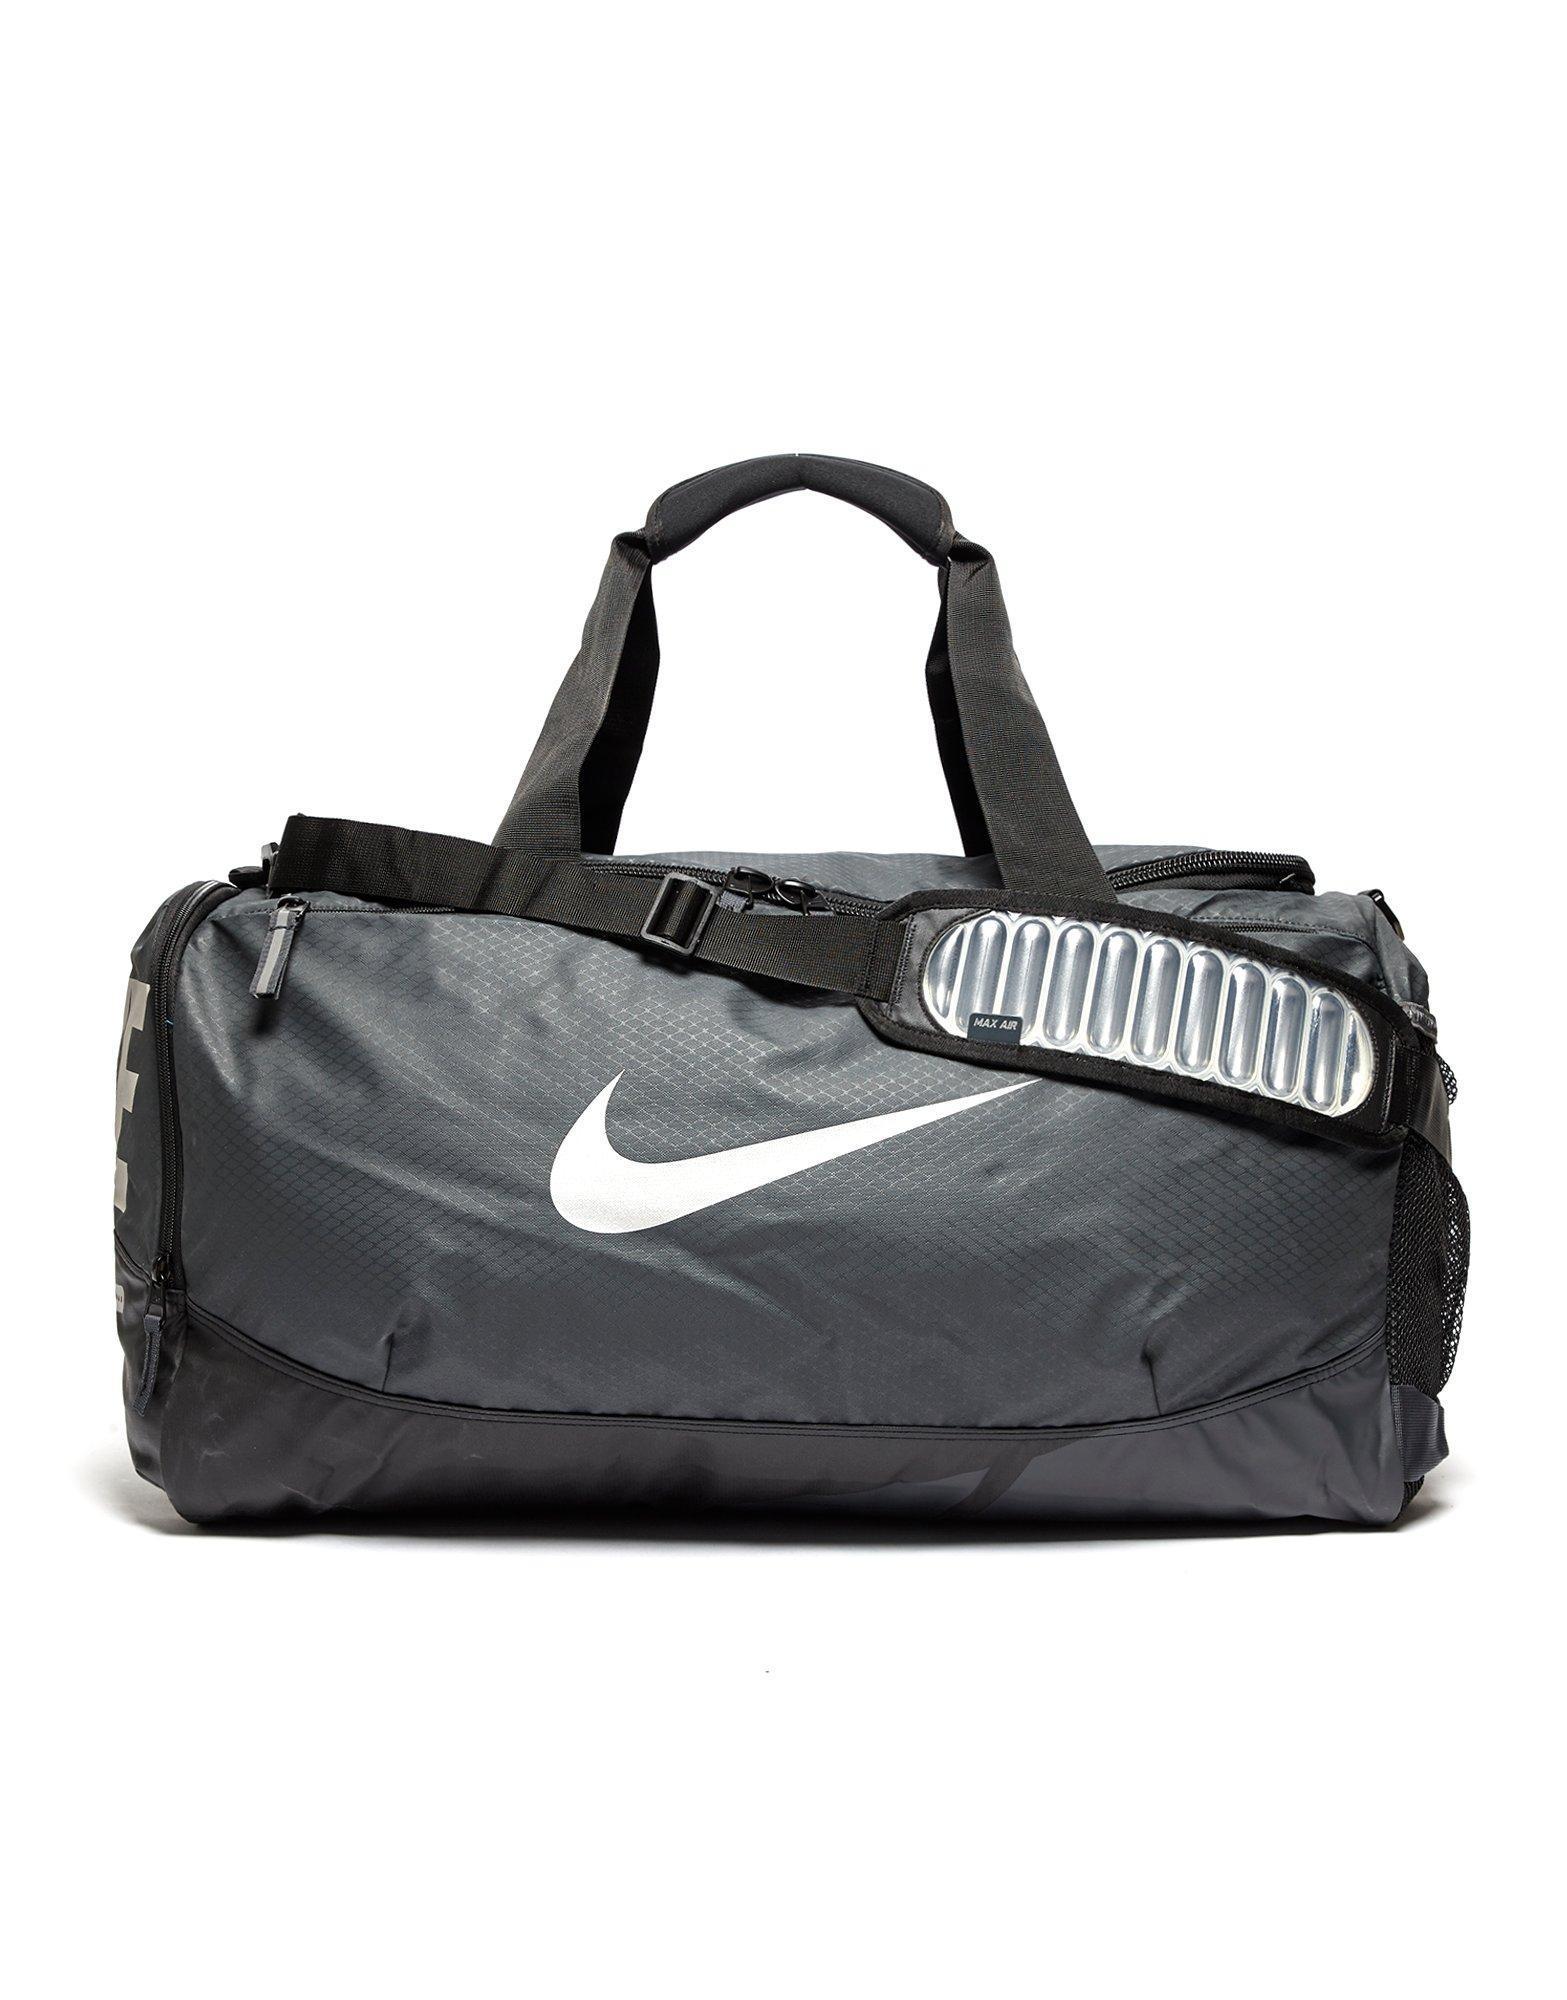 0b190ff7c94b Jd Sports Nike Duffle Bag